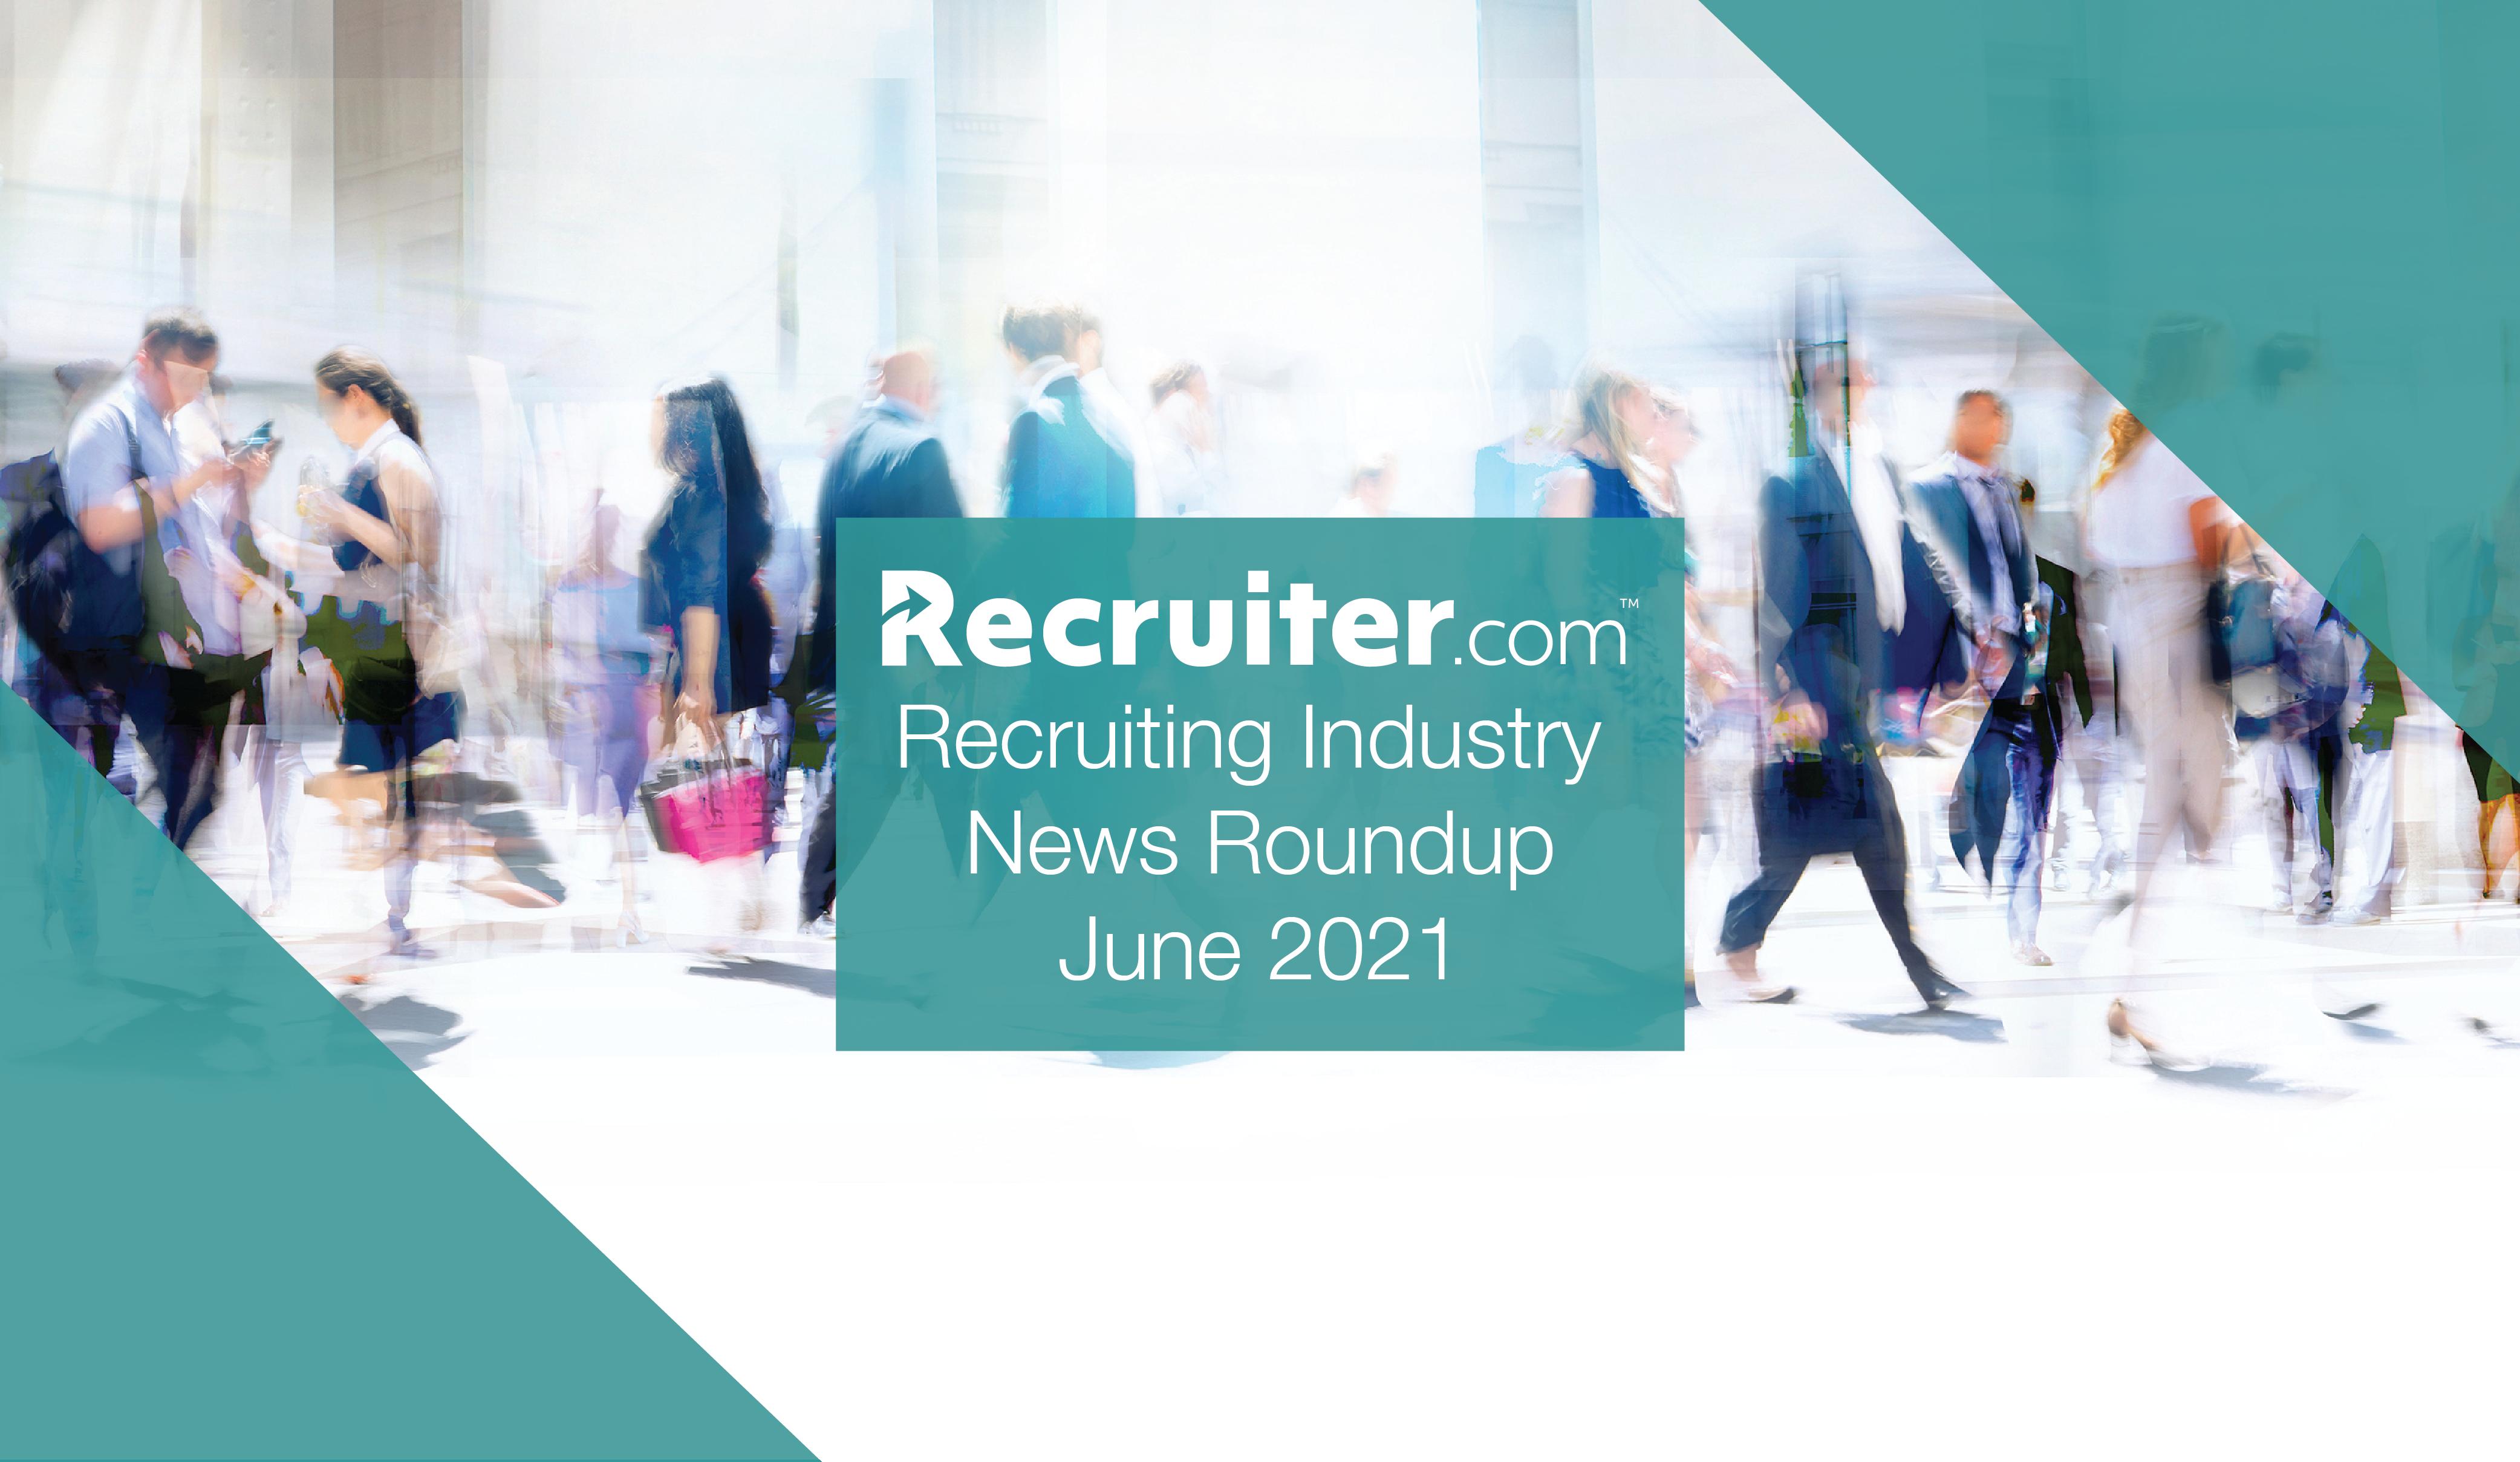 Recruiting Industry News June 2021